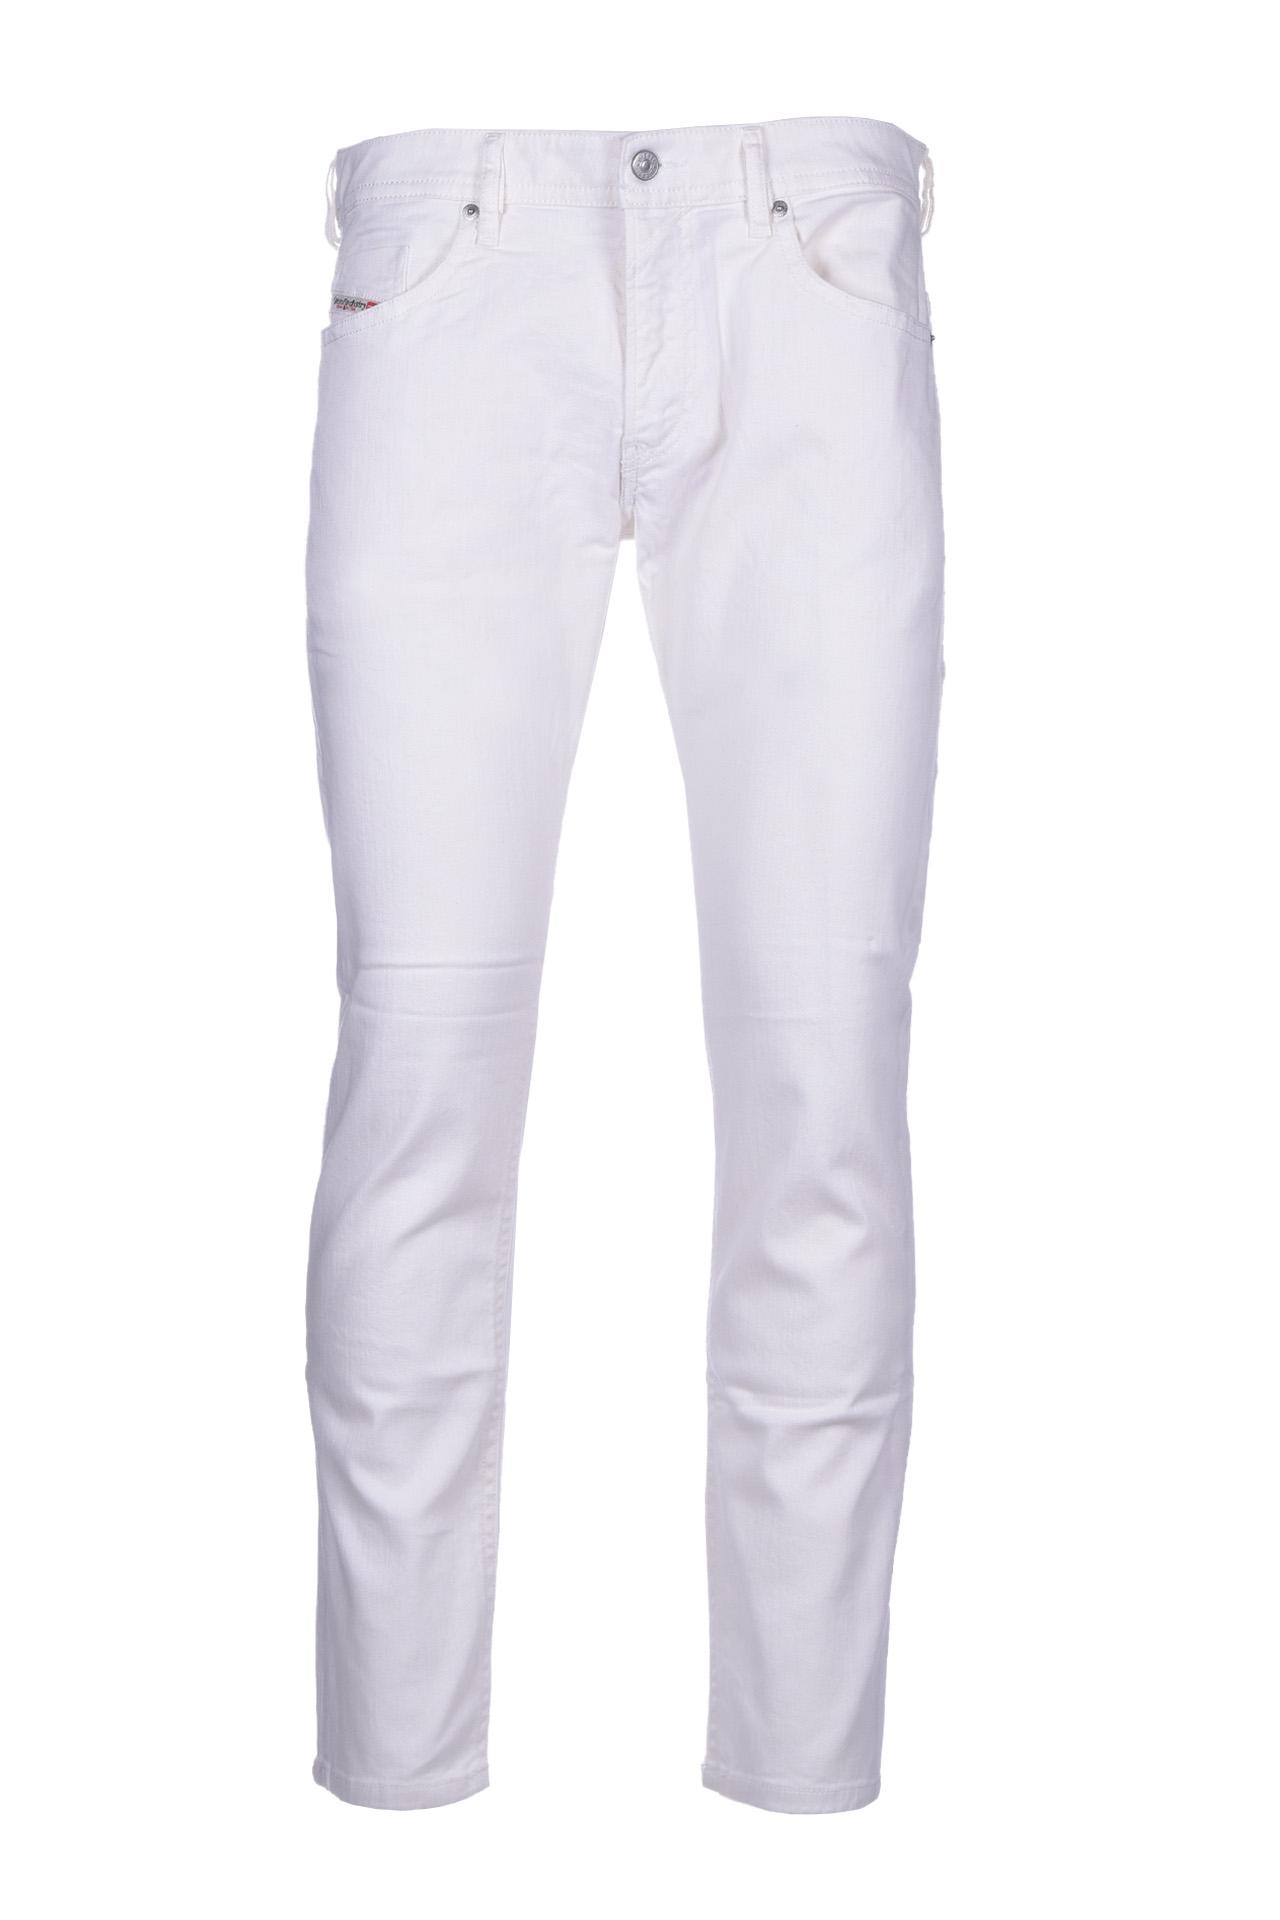 Jeans thommer-x - Bianco DIESEL | Pantaloni | 00SB6C 069JU100